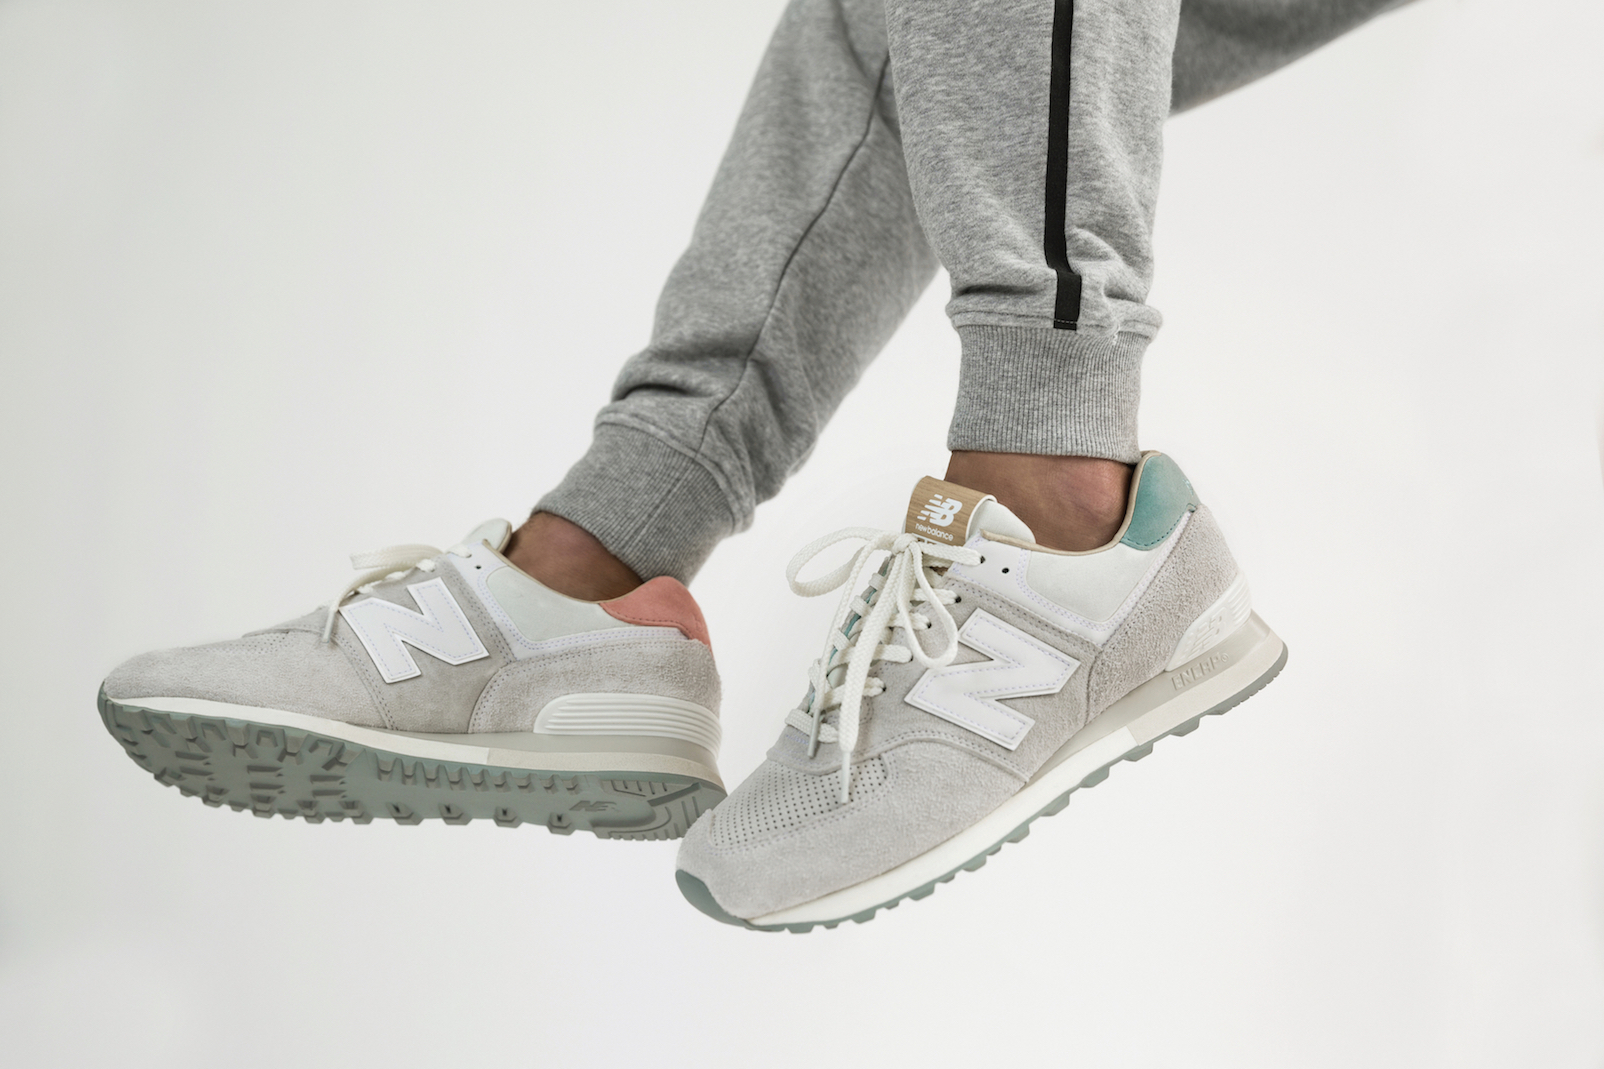 New balance o Saucony: quale scarpa scegliere? - www.stile.it